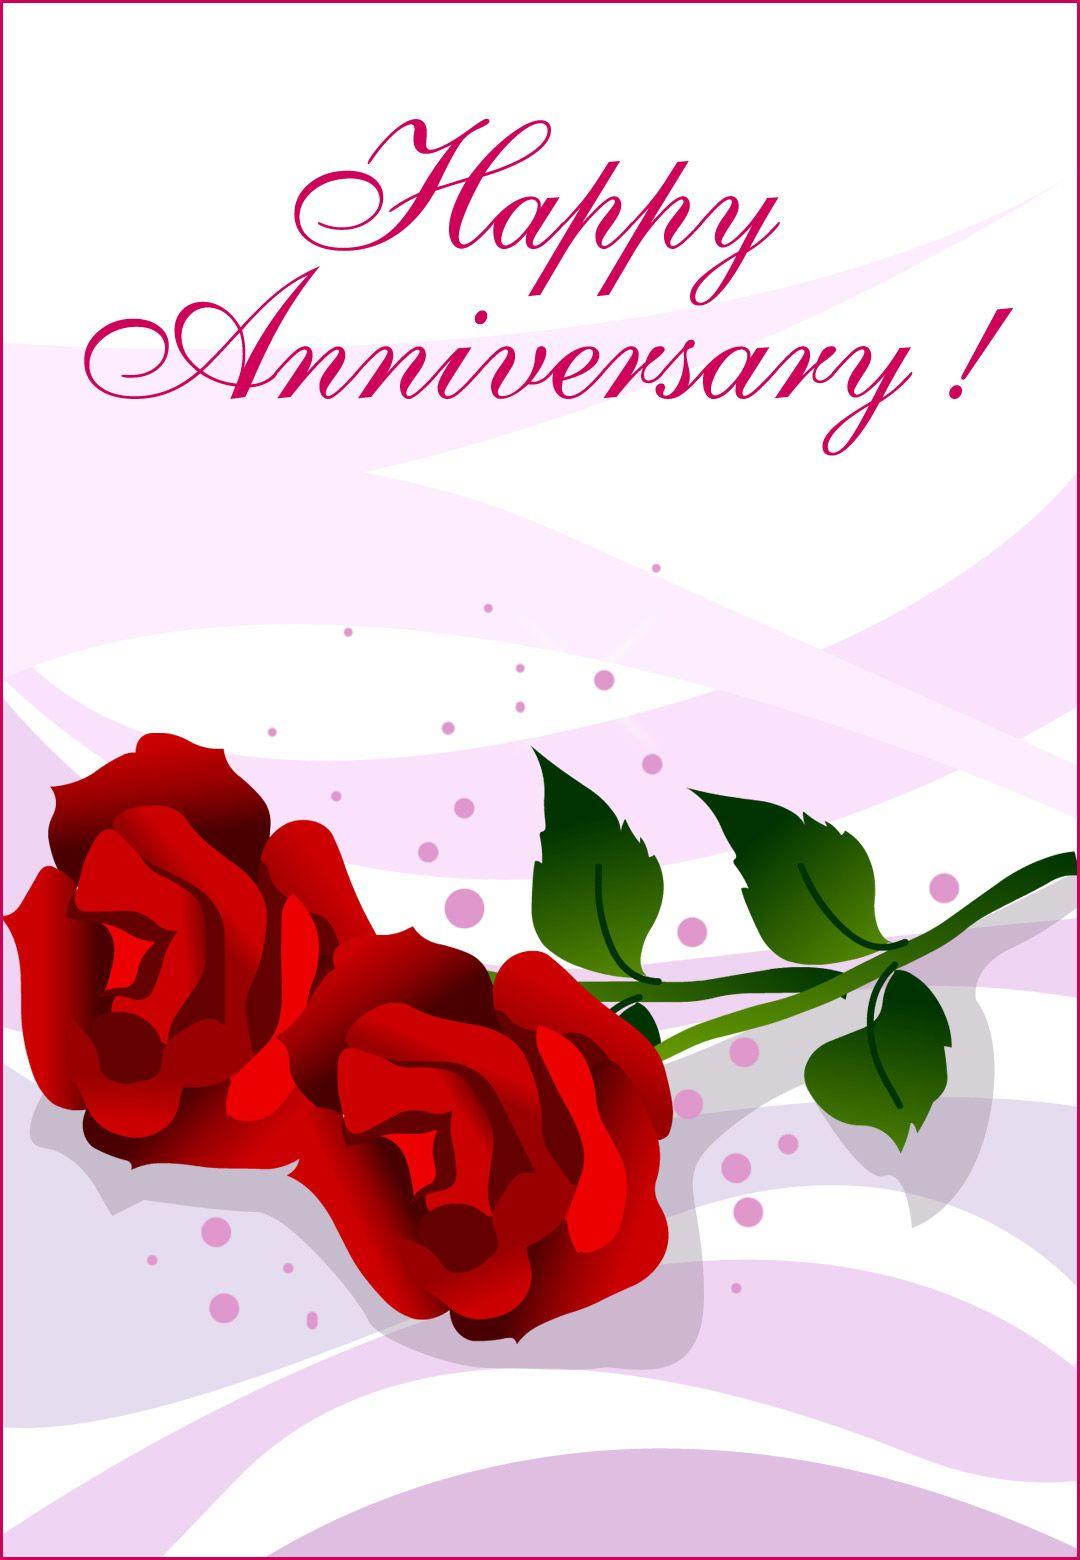 Free Printable Happy Anniversary Greeting Card | Name | Pinterest - Wedding Wish Cards Printable Free